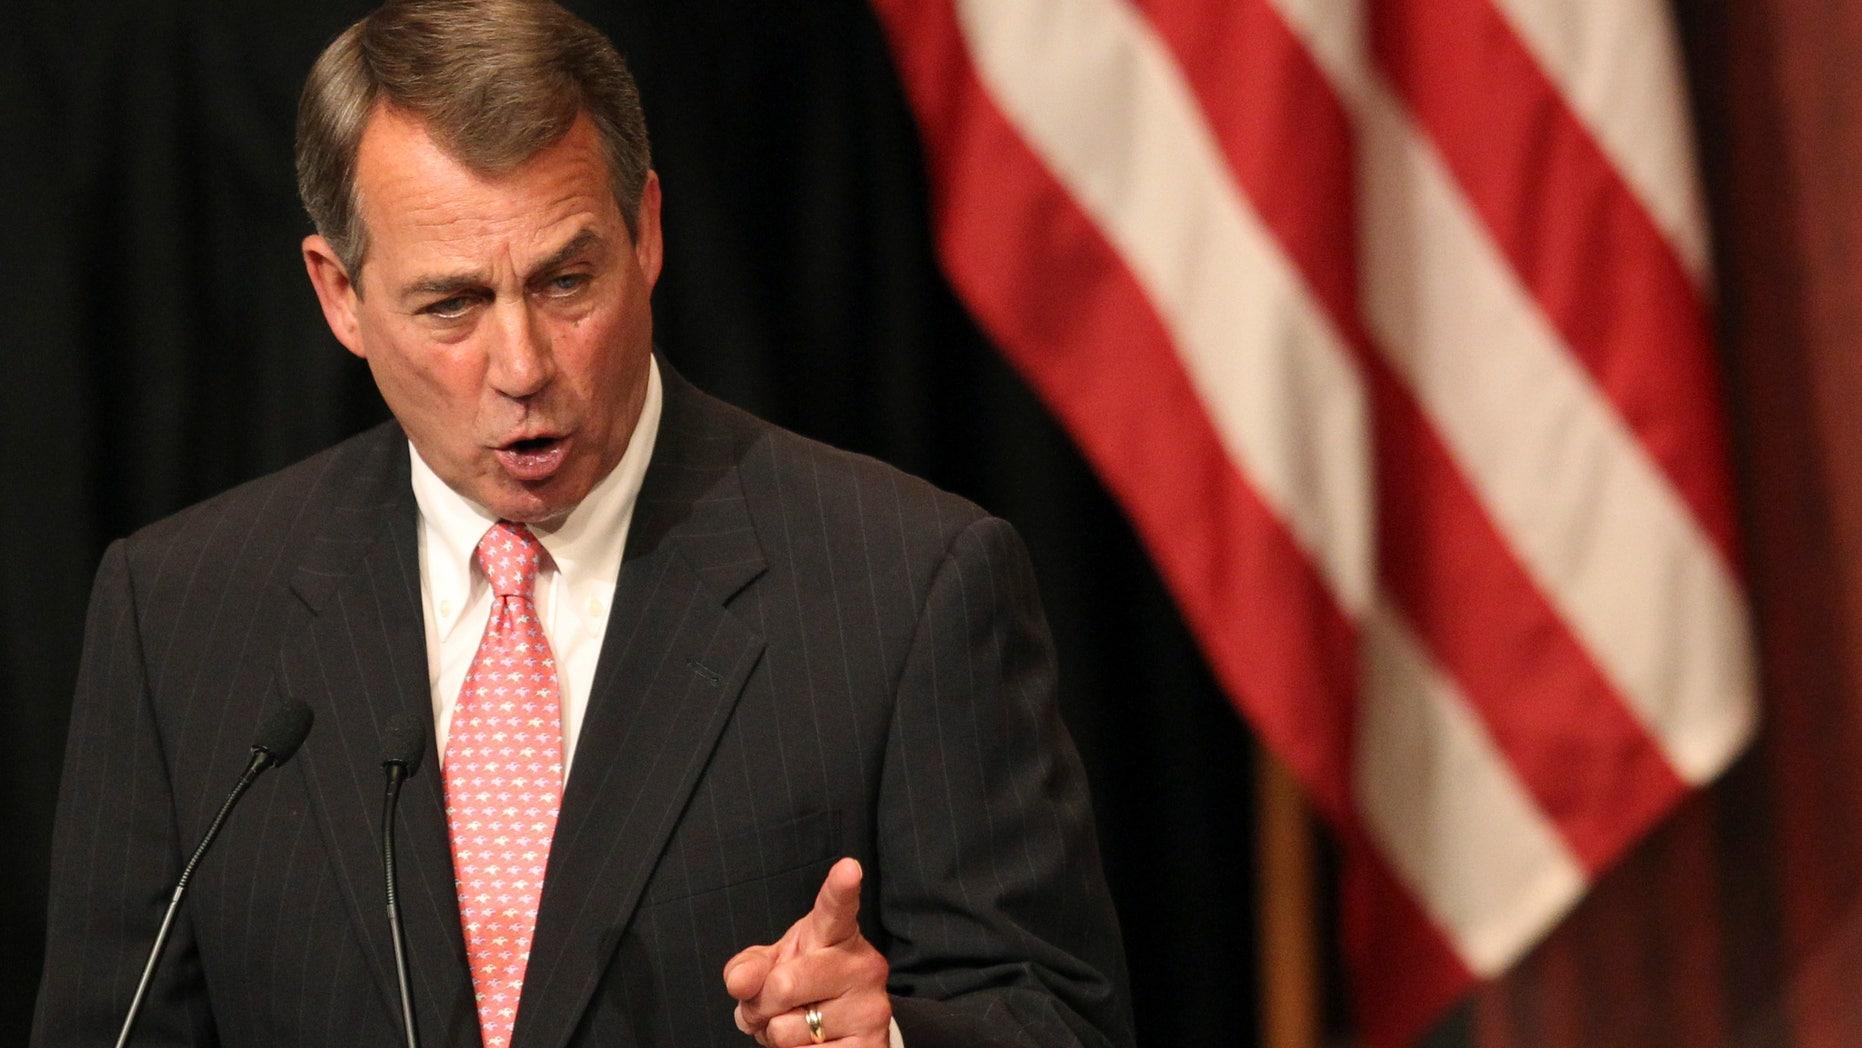 Monday: House Speaker John Boehner gestures as he addresses the Economic Club of New York in New York.